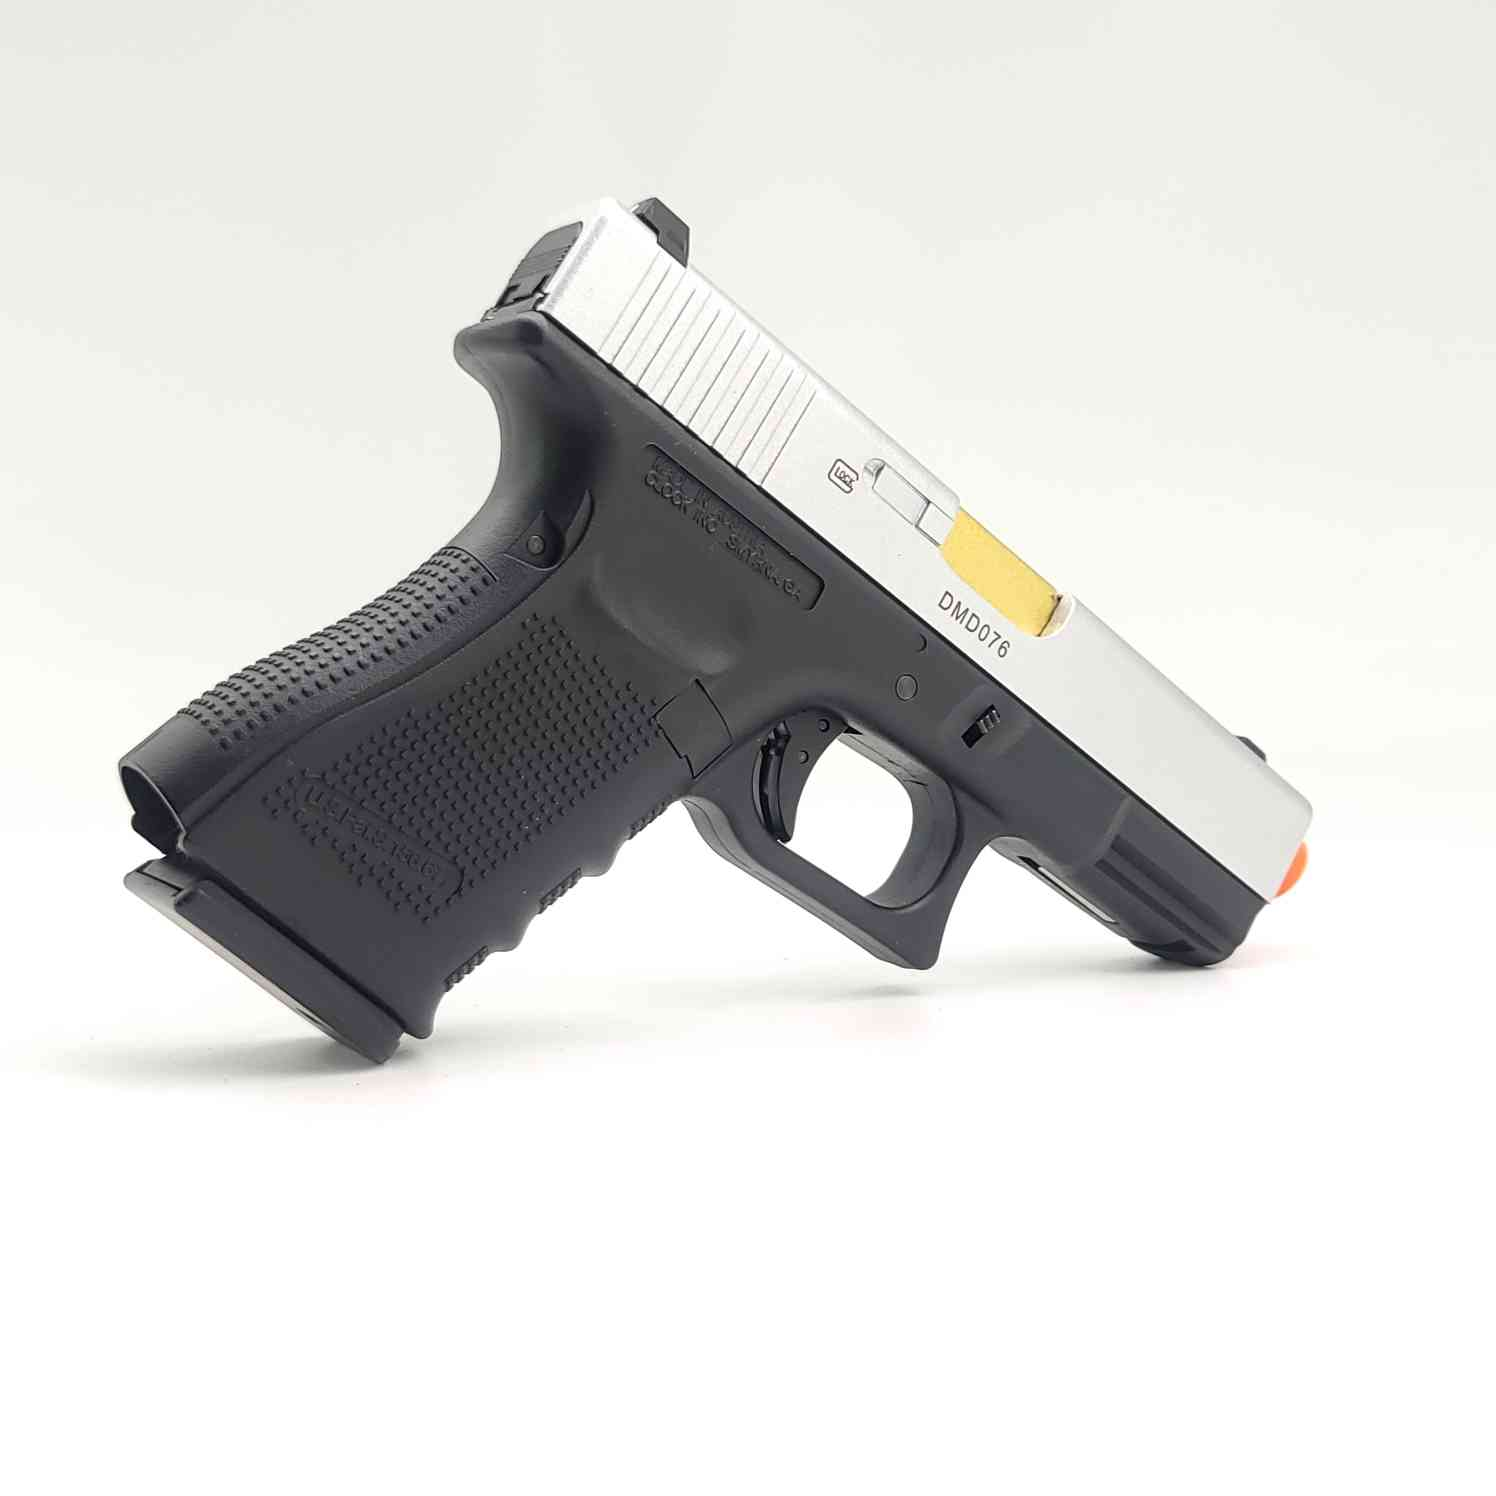 DOUBLE BELL Glock G19 GEN4 Gas Powered Gel Blaster SILVER [772D] Renegade Blasters